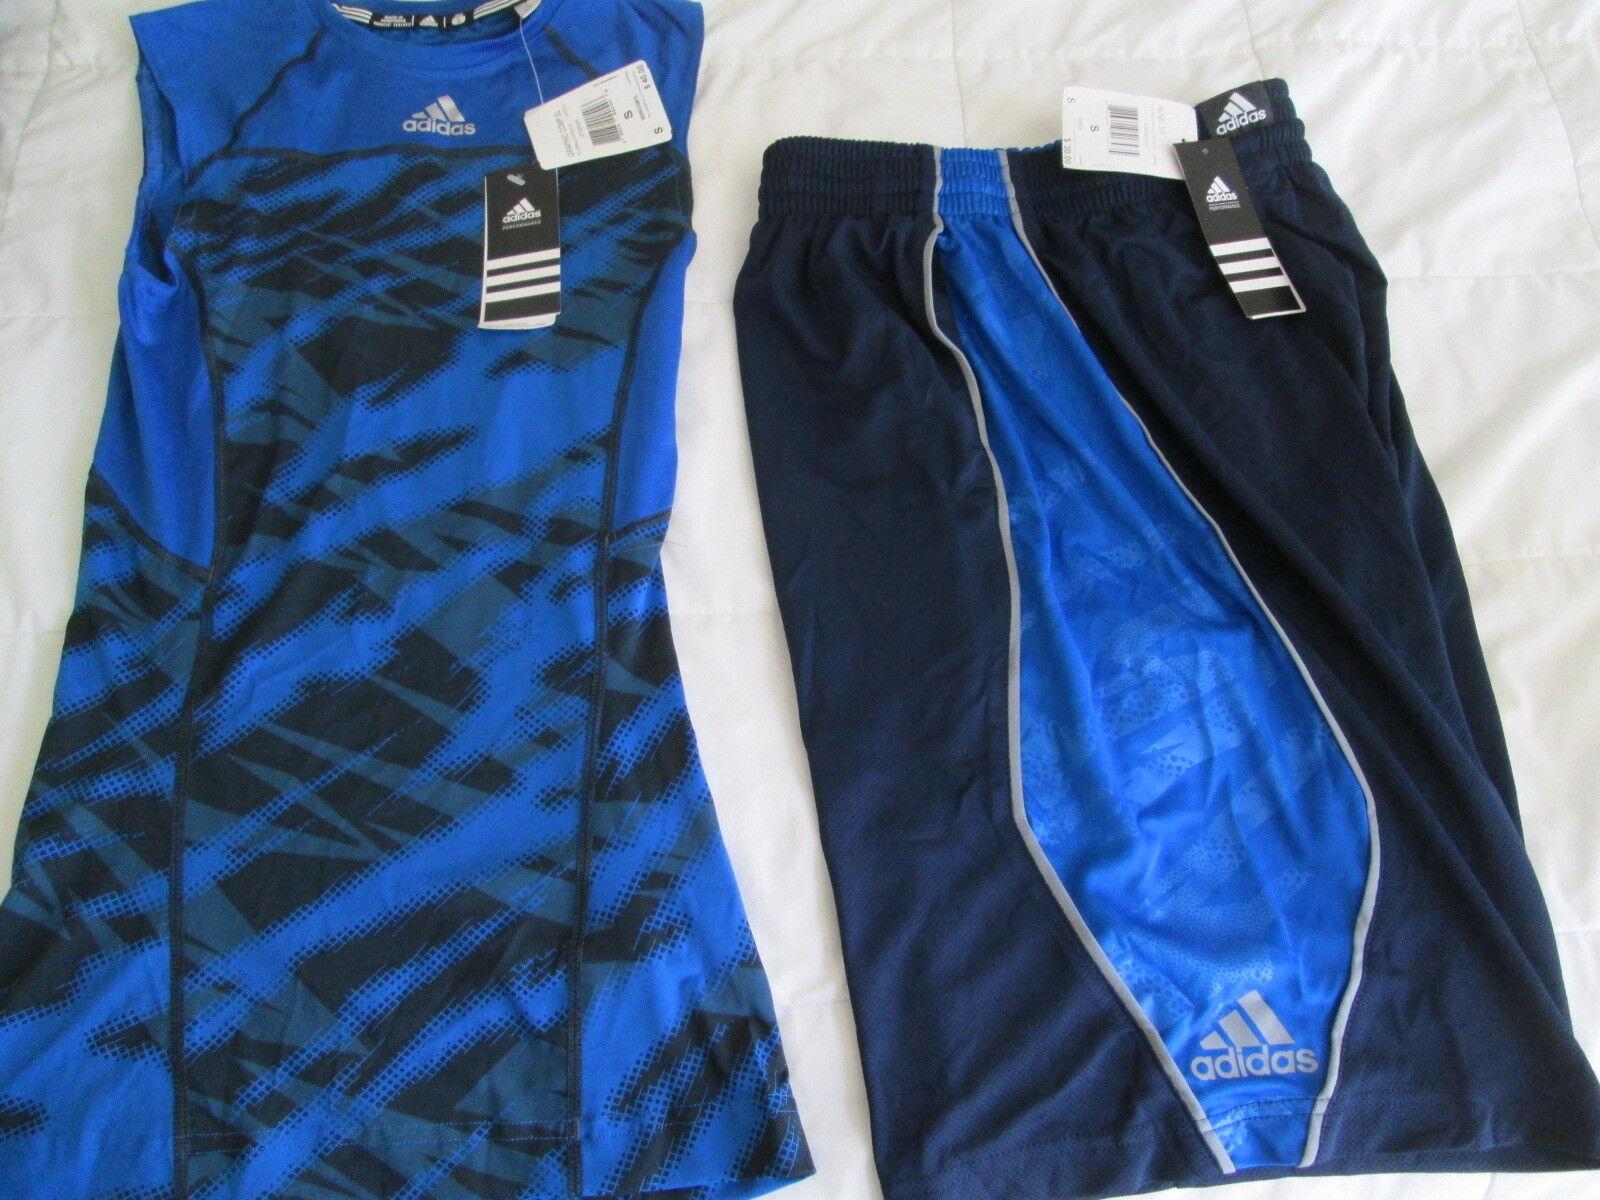 NEW Uomo ADIDAS 2Pc WORKOUT Navy & Blue Outfit Shirt+Shorts Sm FREE SHIP